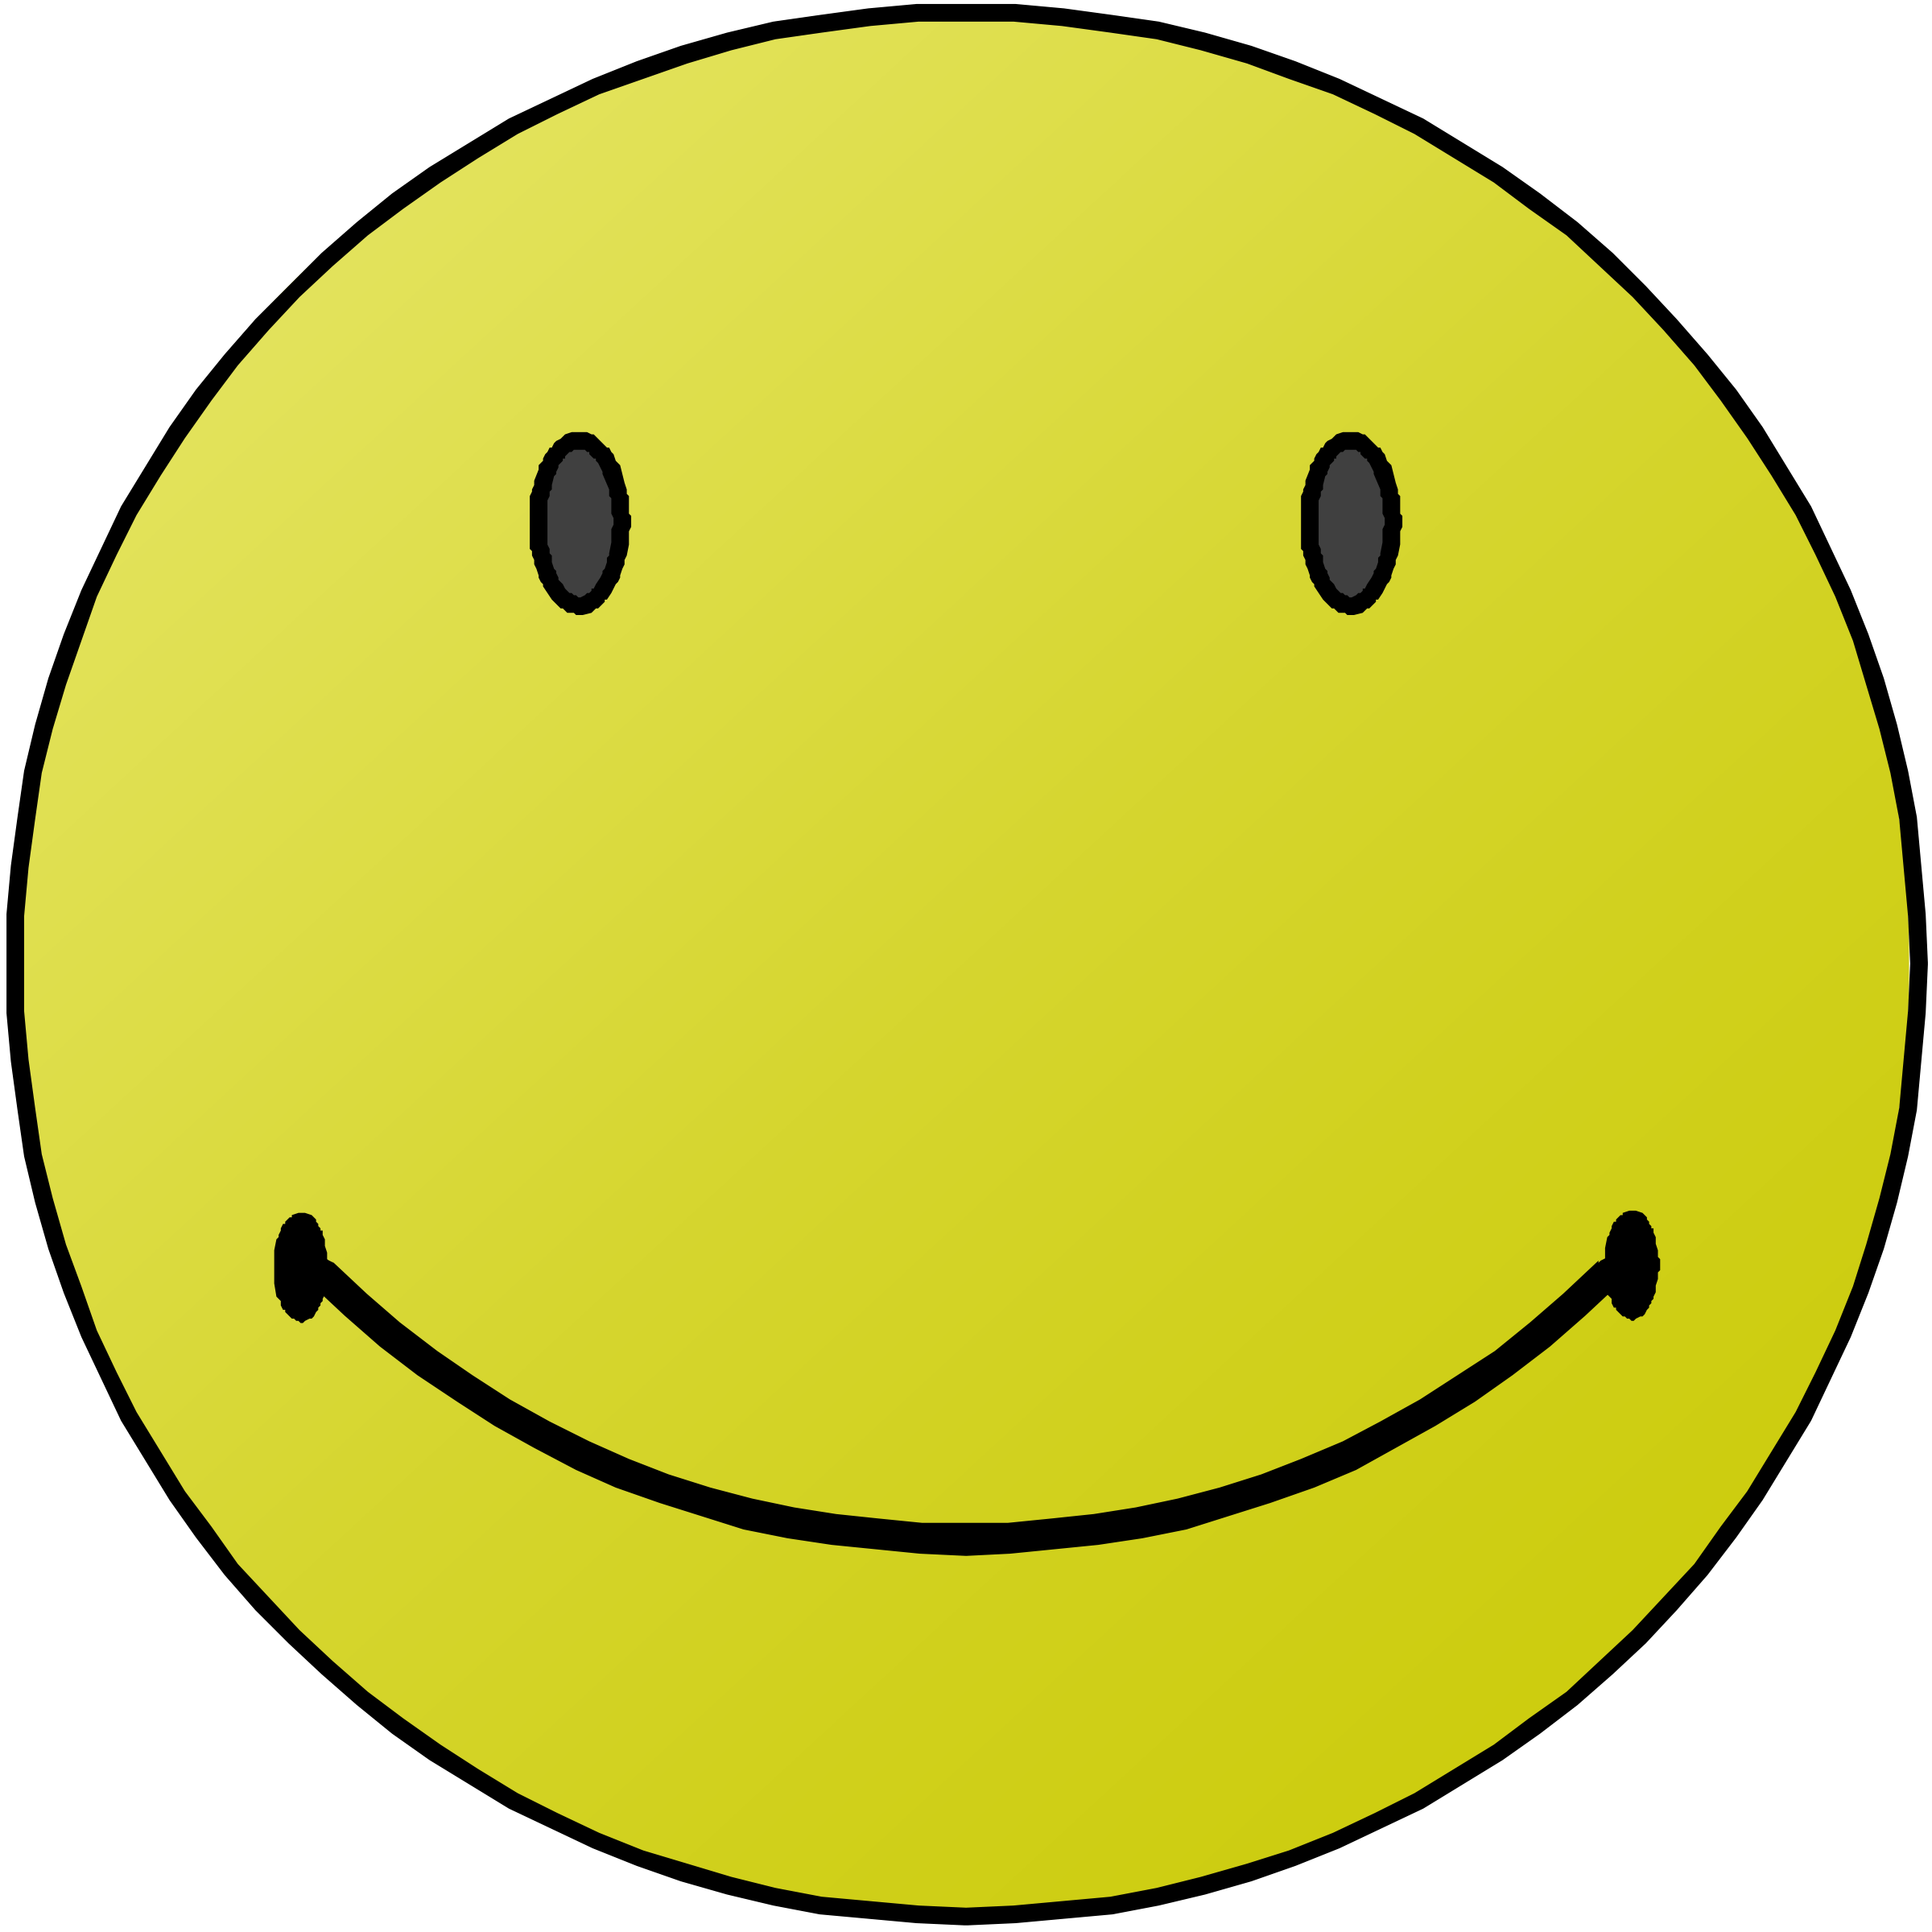 2400x2400 Smiling Face Clip Art